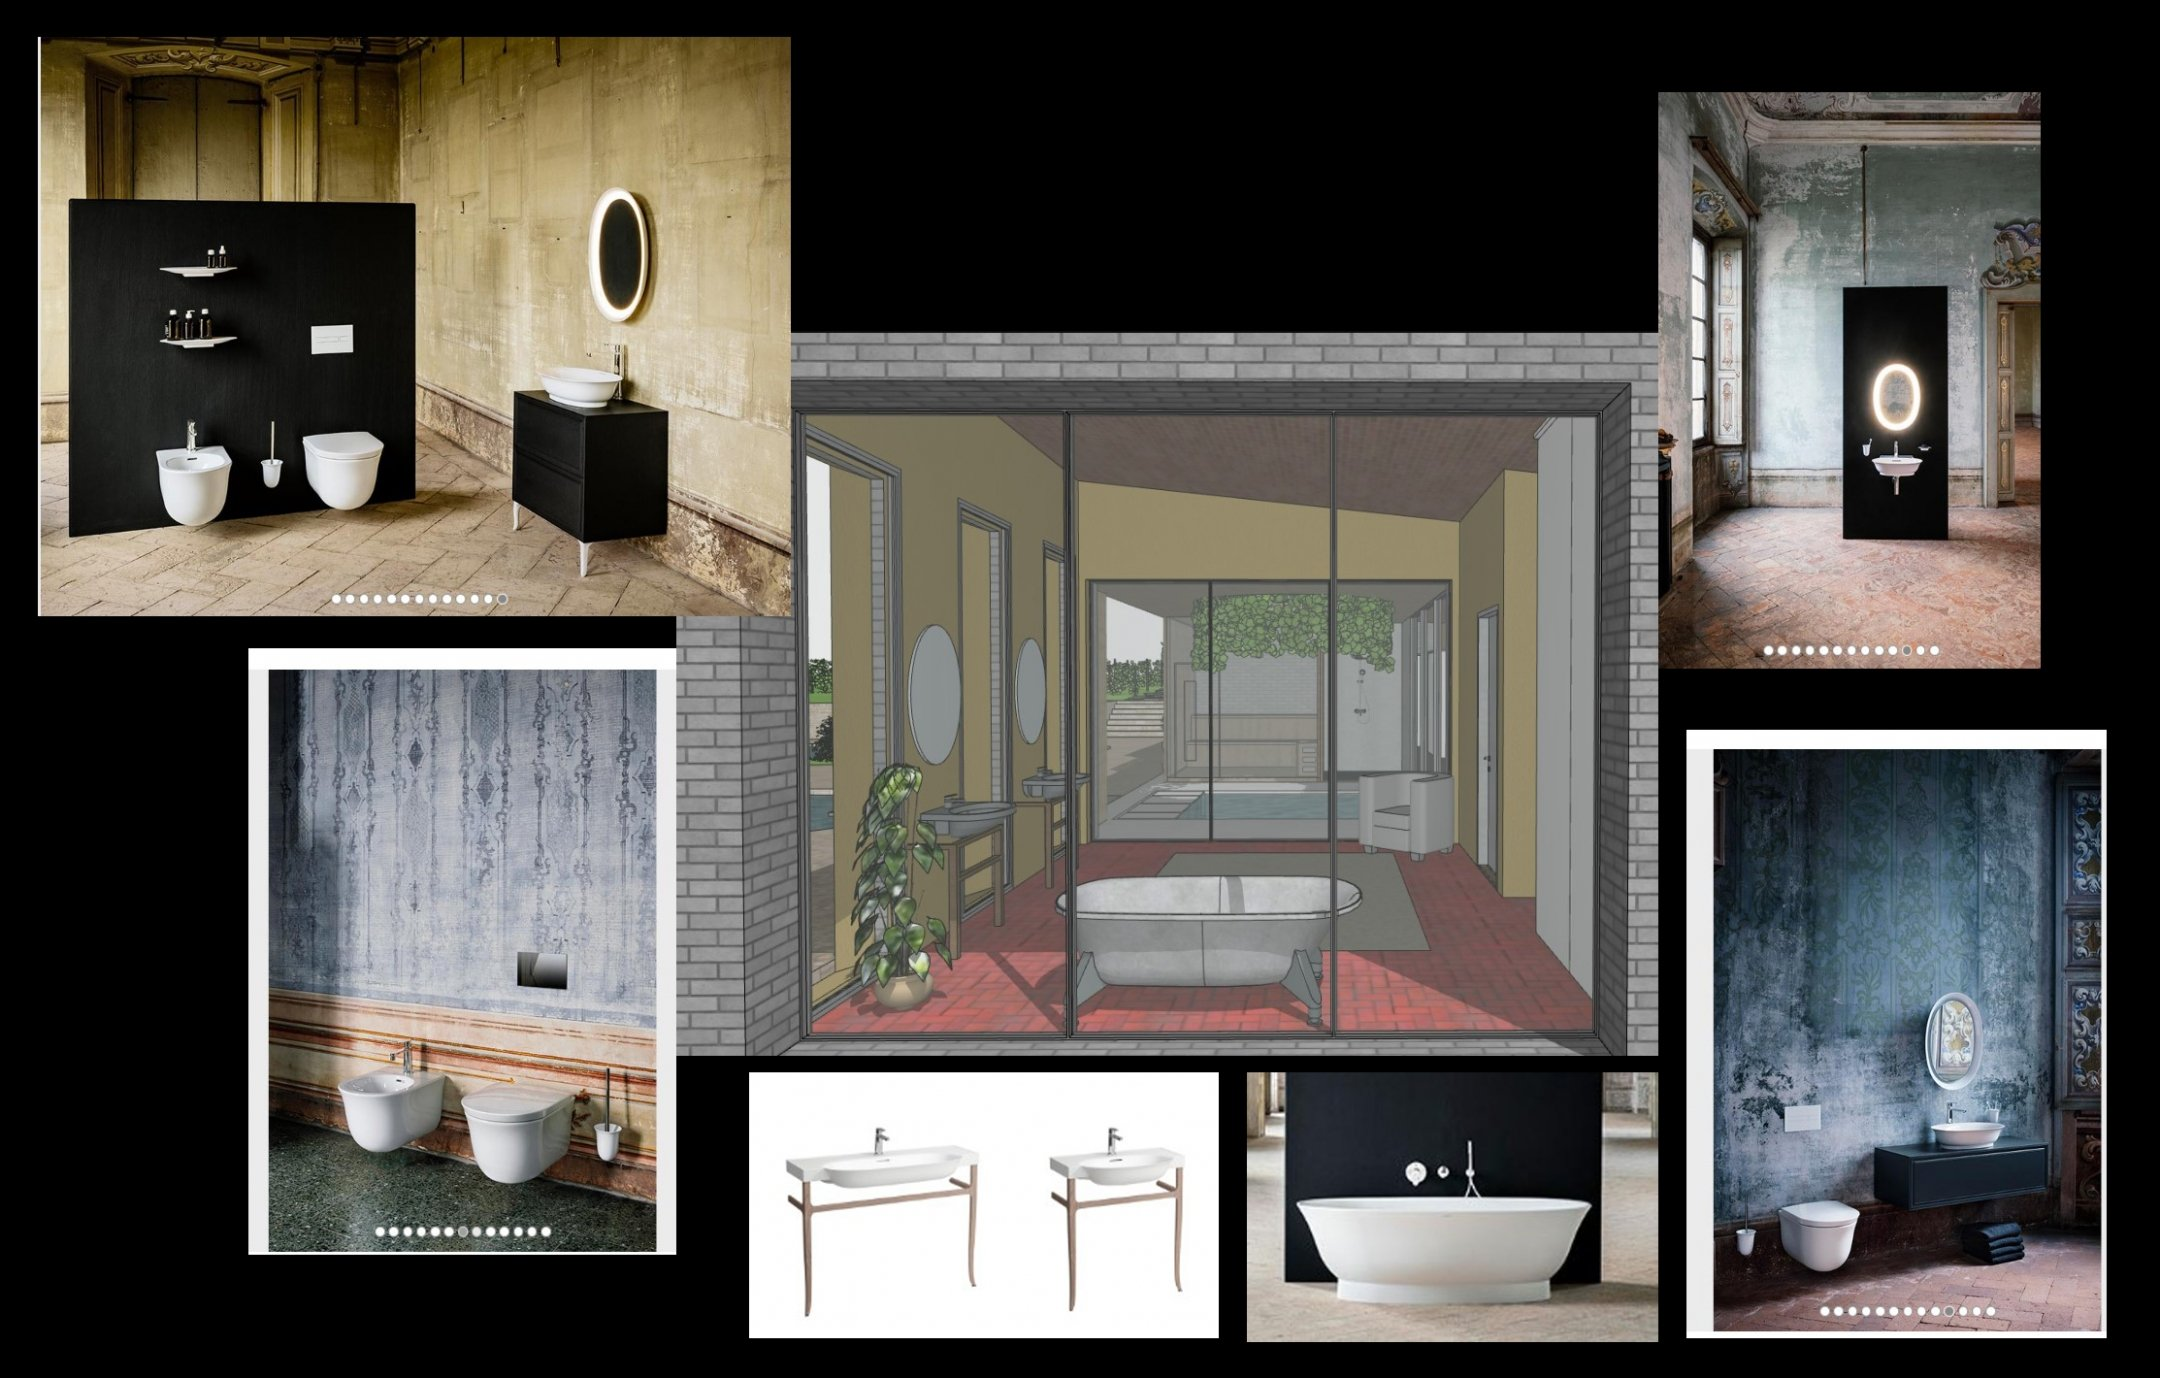 A Moodboard for Creating a Bathroom CG Visual